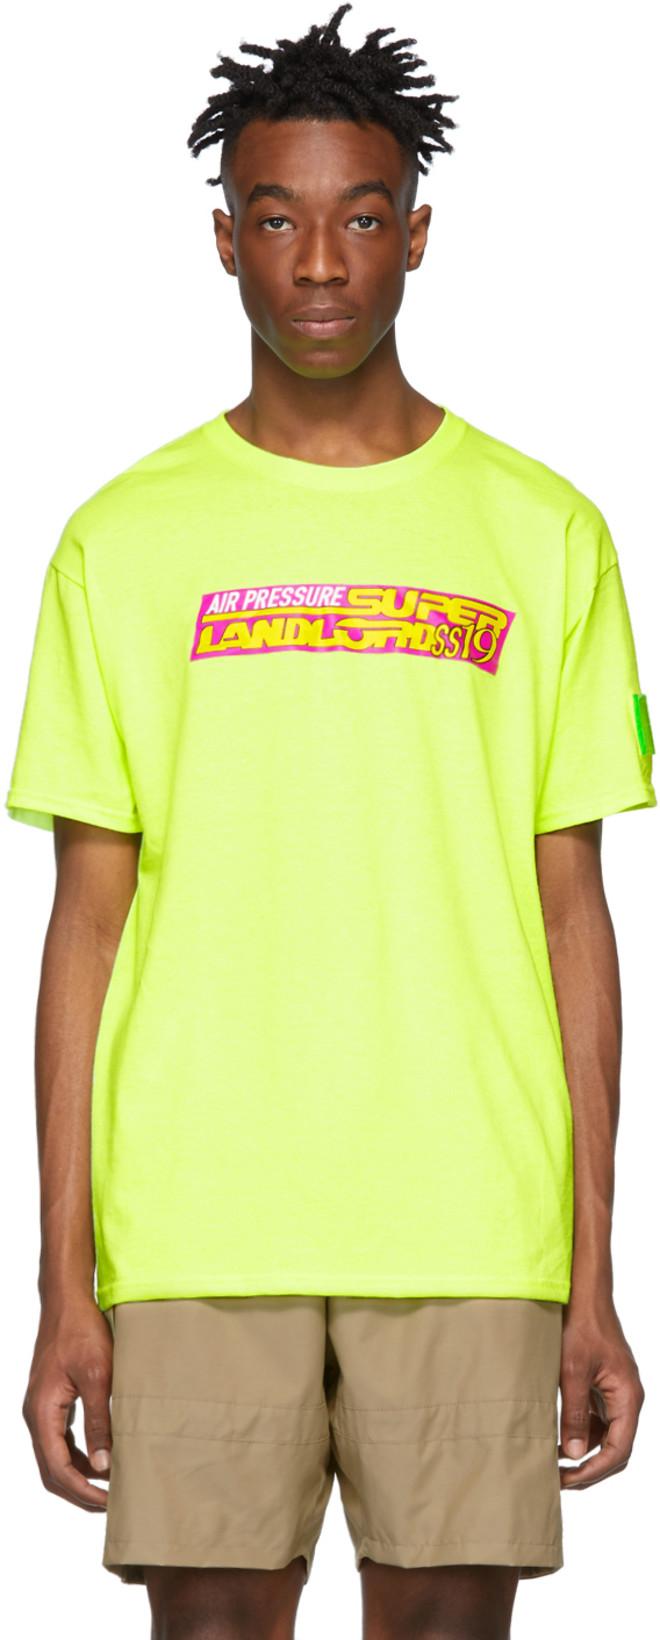 https://www.ssense.com/en-ca/men/product/landlord/yellow-air-pressure-t-shirt/3678289